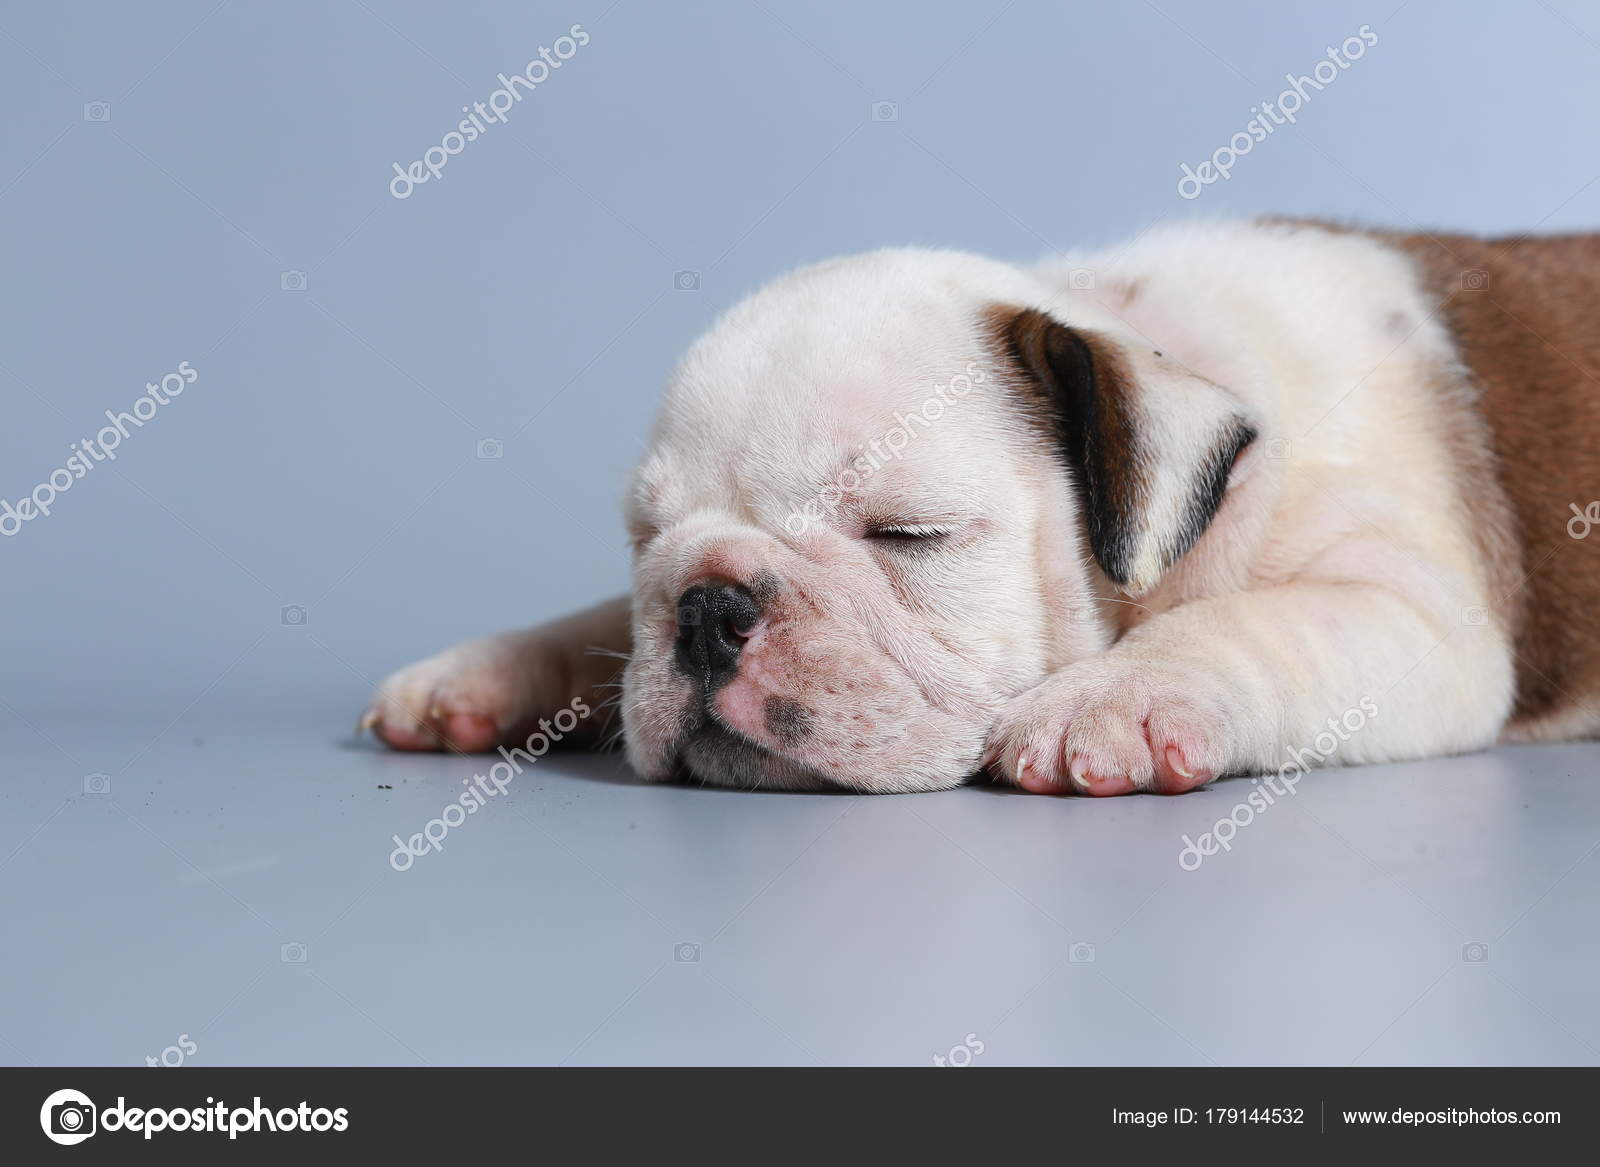 Month Purebred English Bulldog Puppy Gray Screen Stock Photo C S Thanawathreborn Gmail Com 179144532